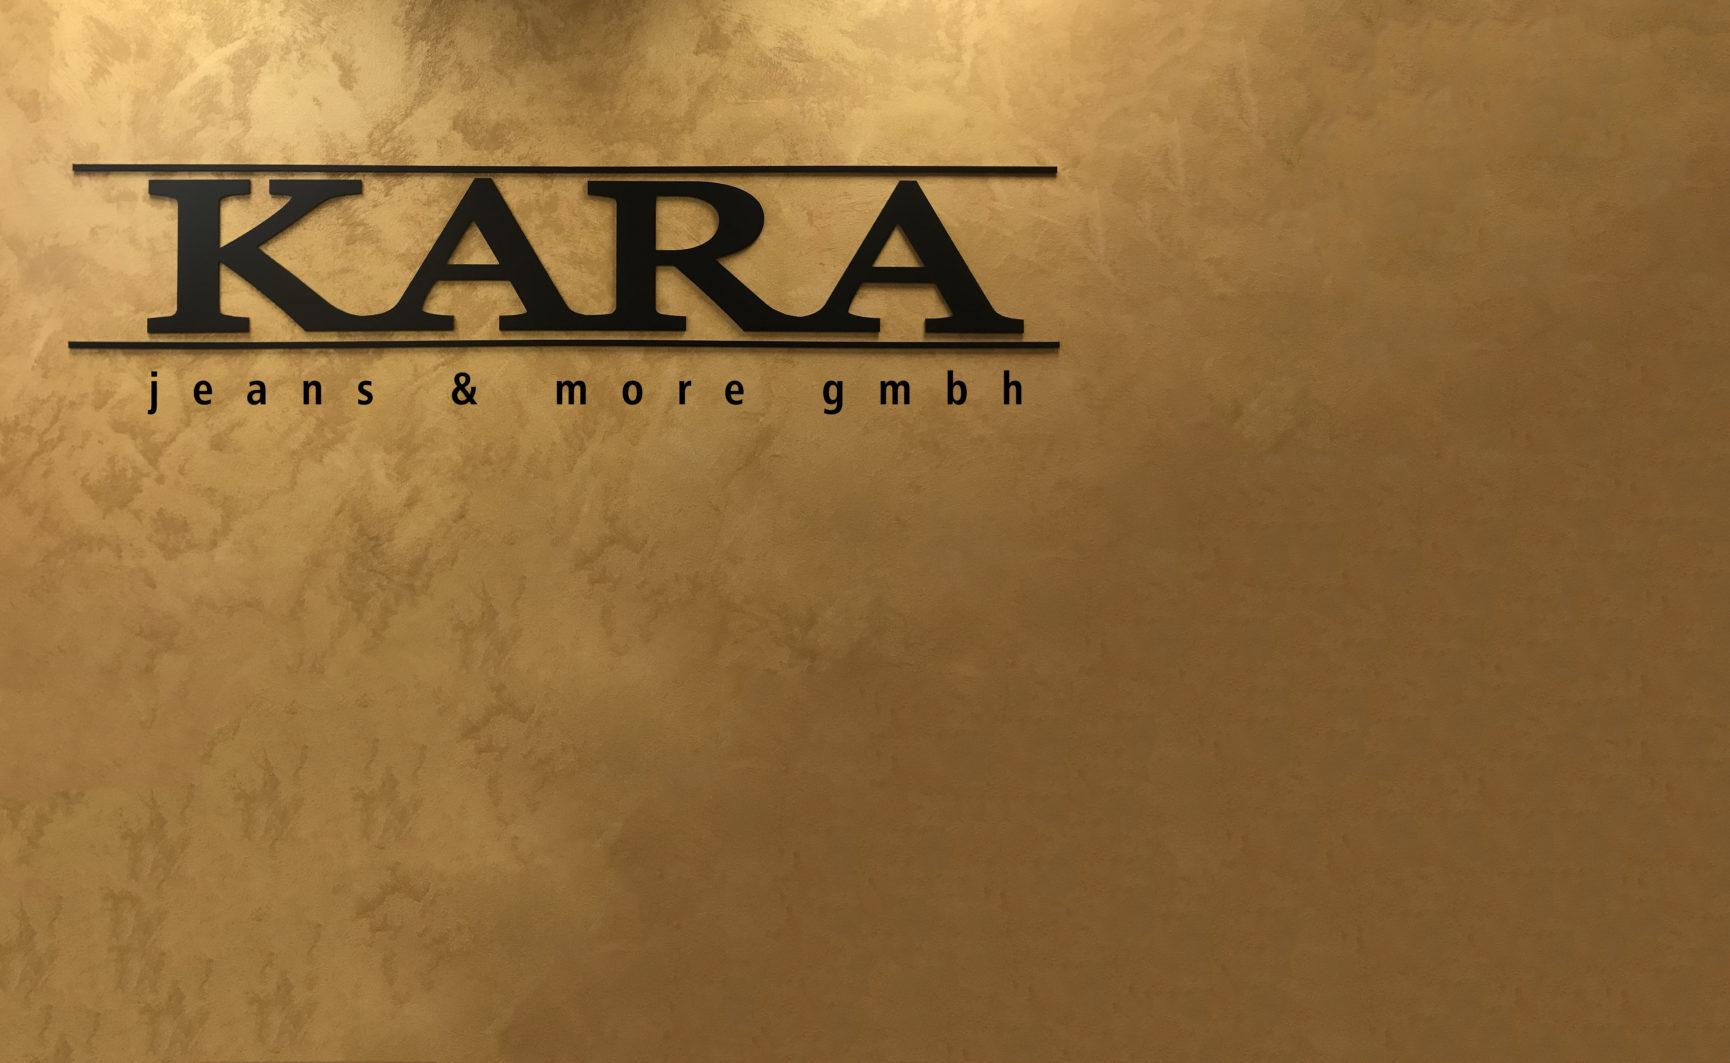 Kara jeans & more